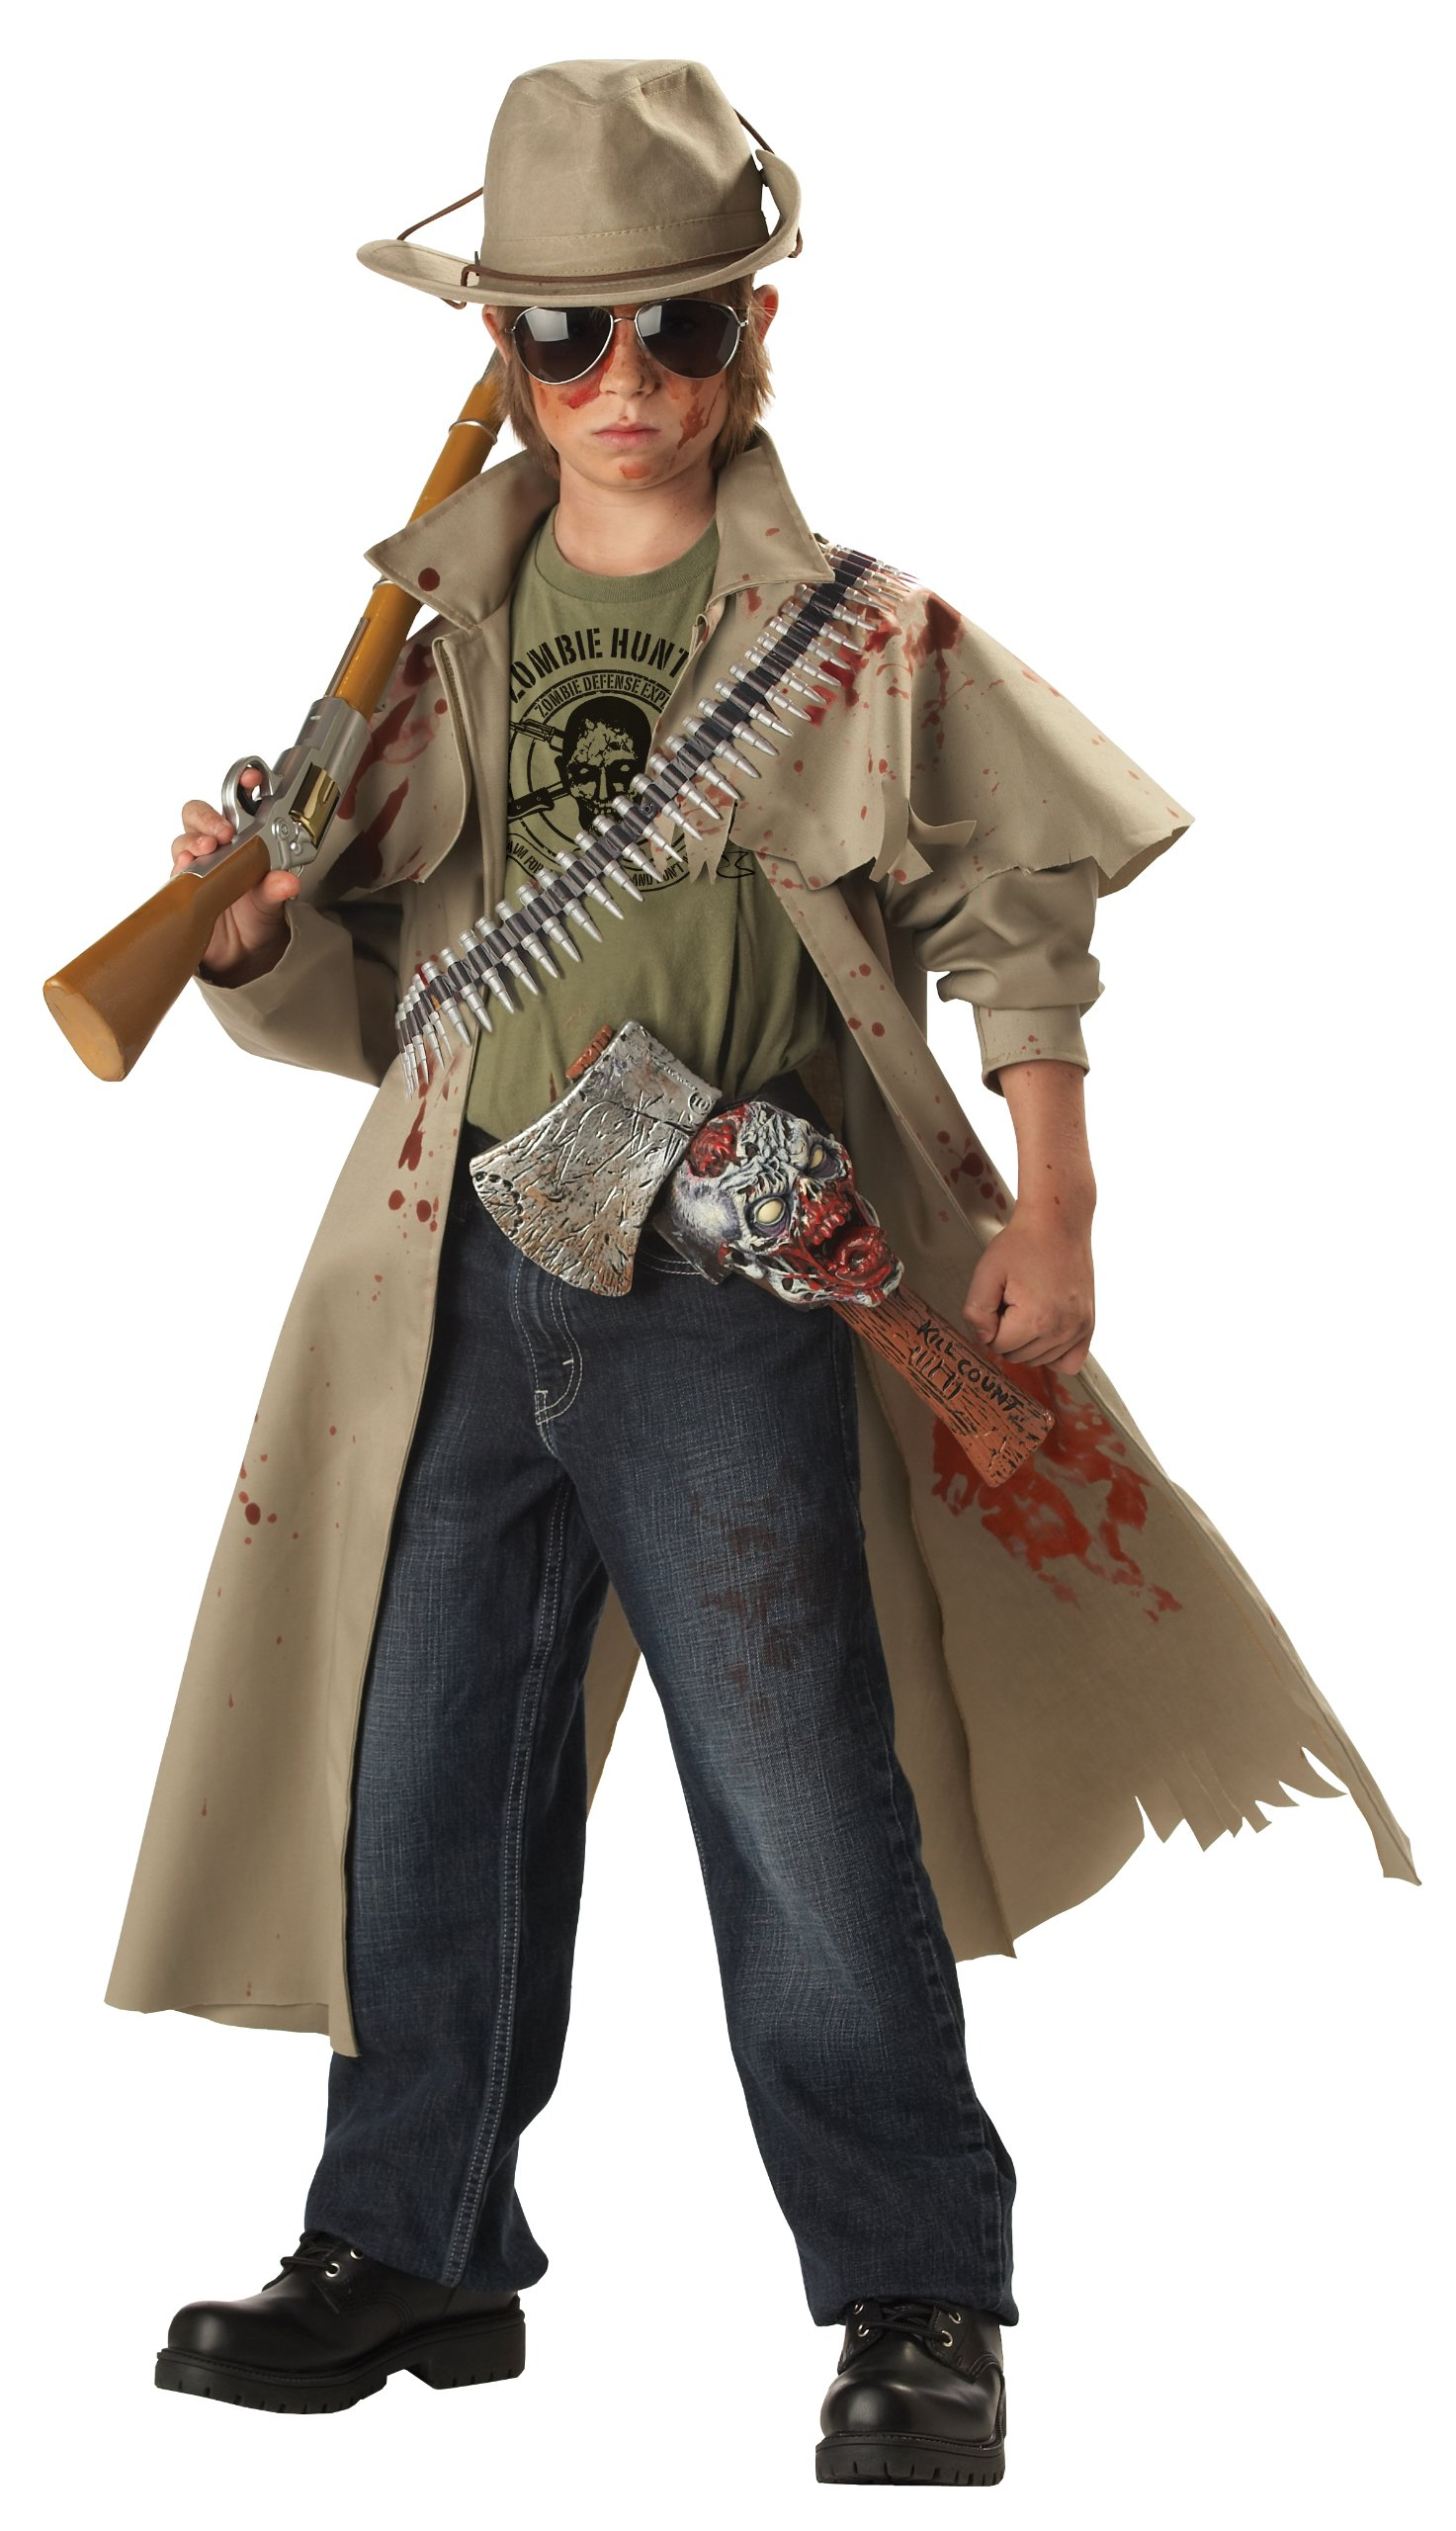 California Costumes Toys Zombie Hunter, Tan, Medium